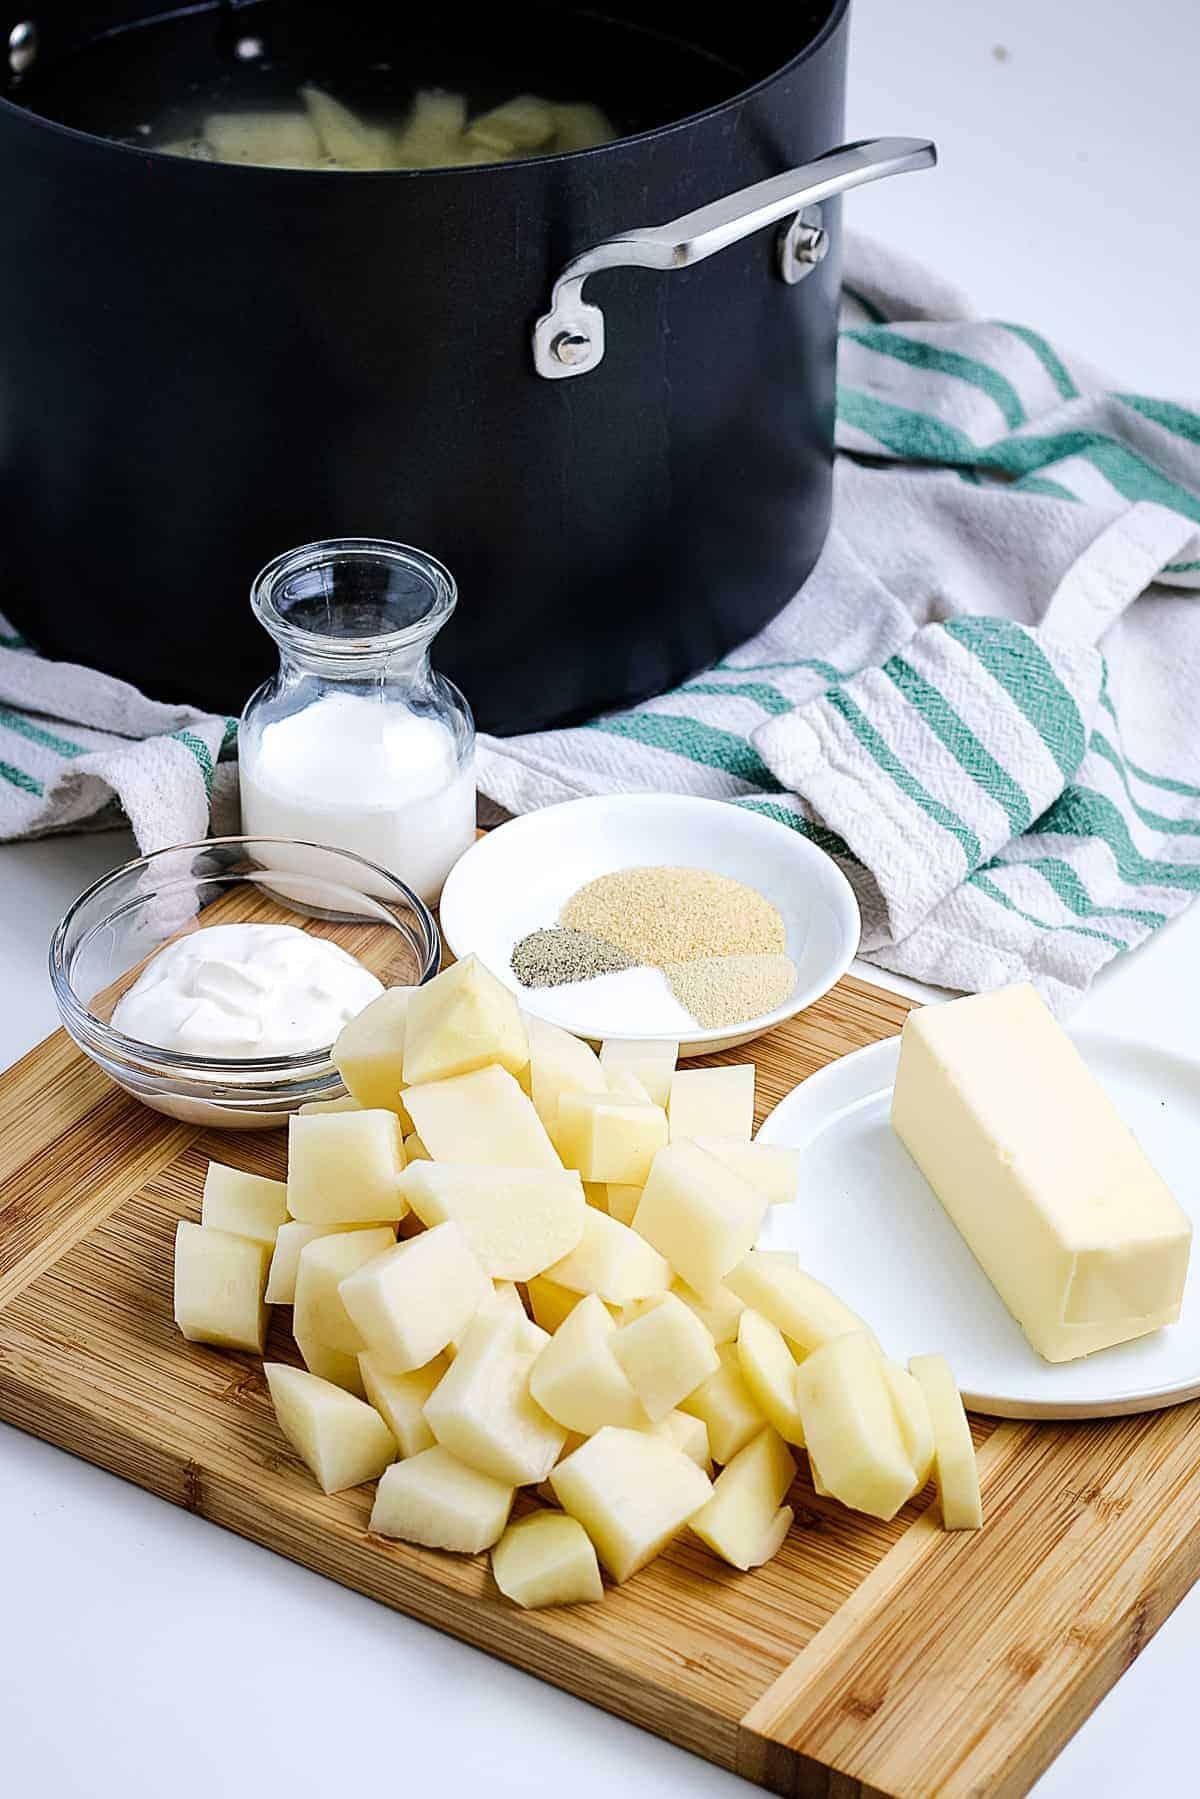 Ingredients to Make mashed potatoes on cutting board